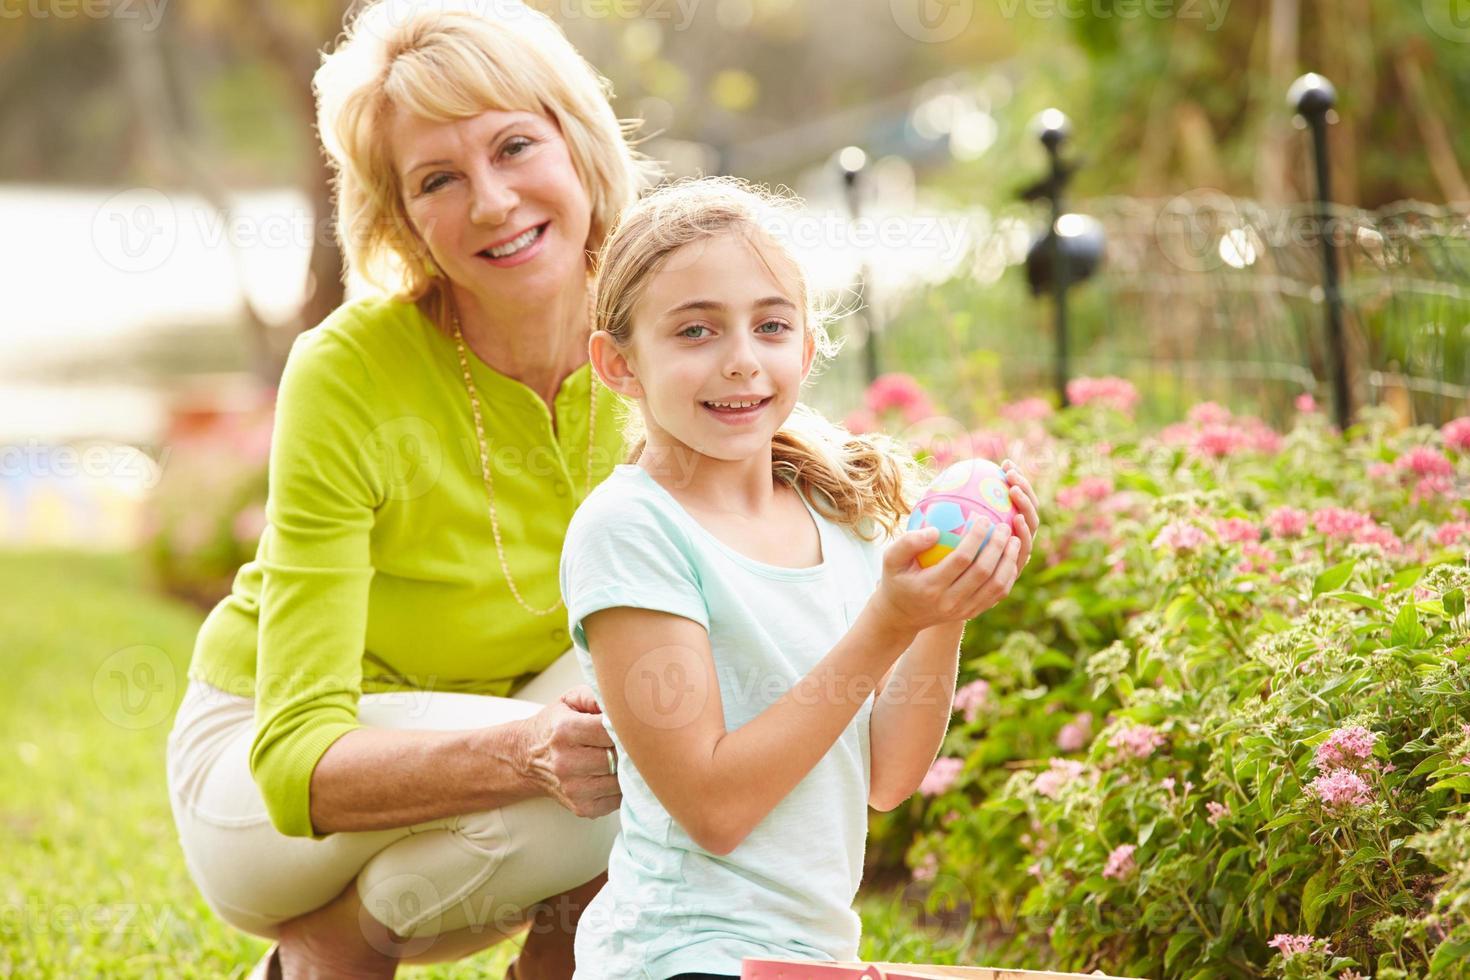 grand-mère, petite-fille, pâques, oeuf, chasse, jardin photo